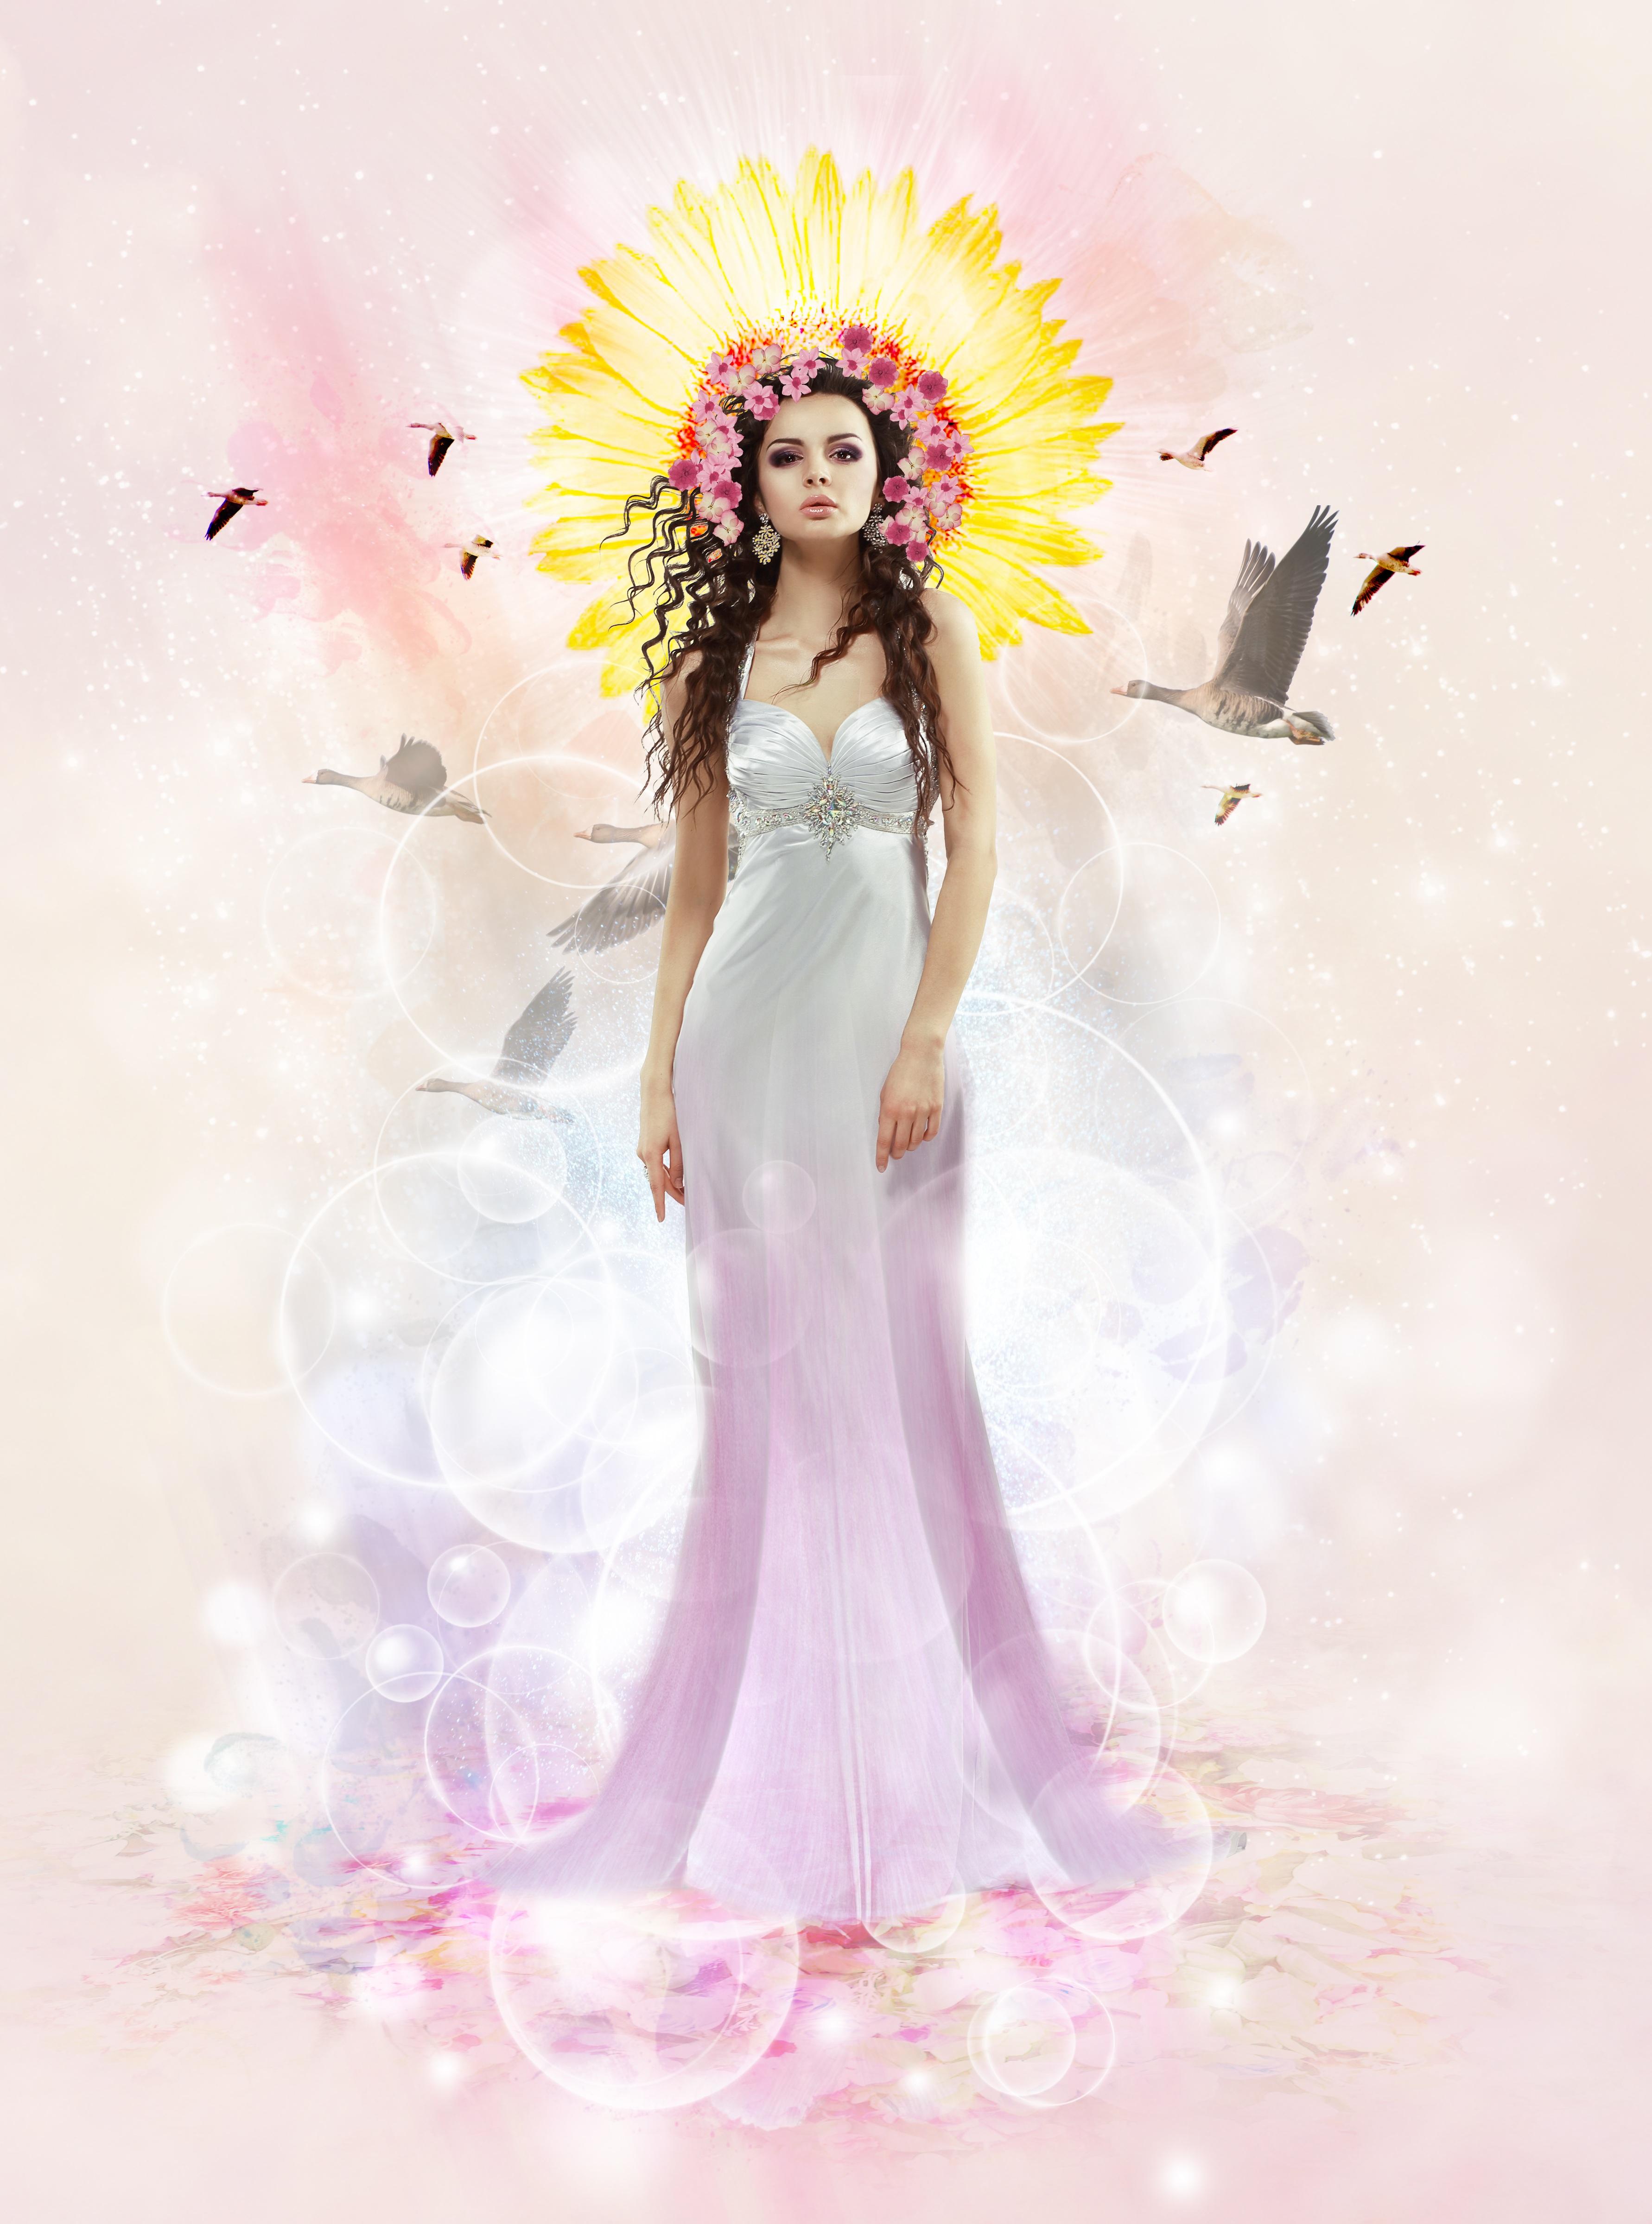 Gambar Alam Wanita Musim Panas Gaun Pengantin Mainan Bunga